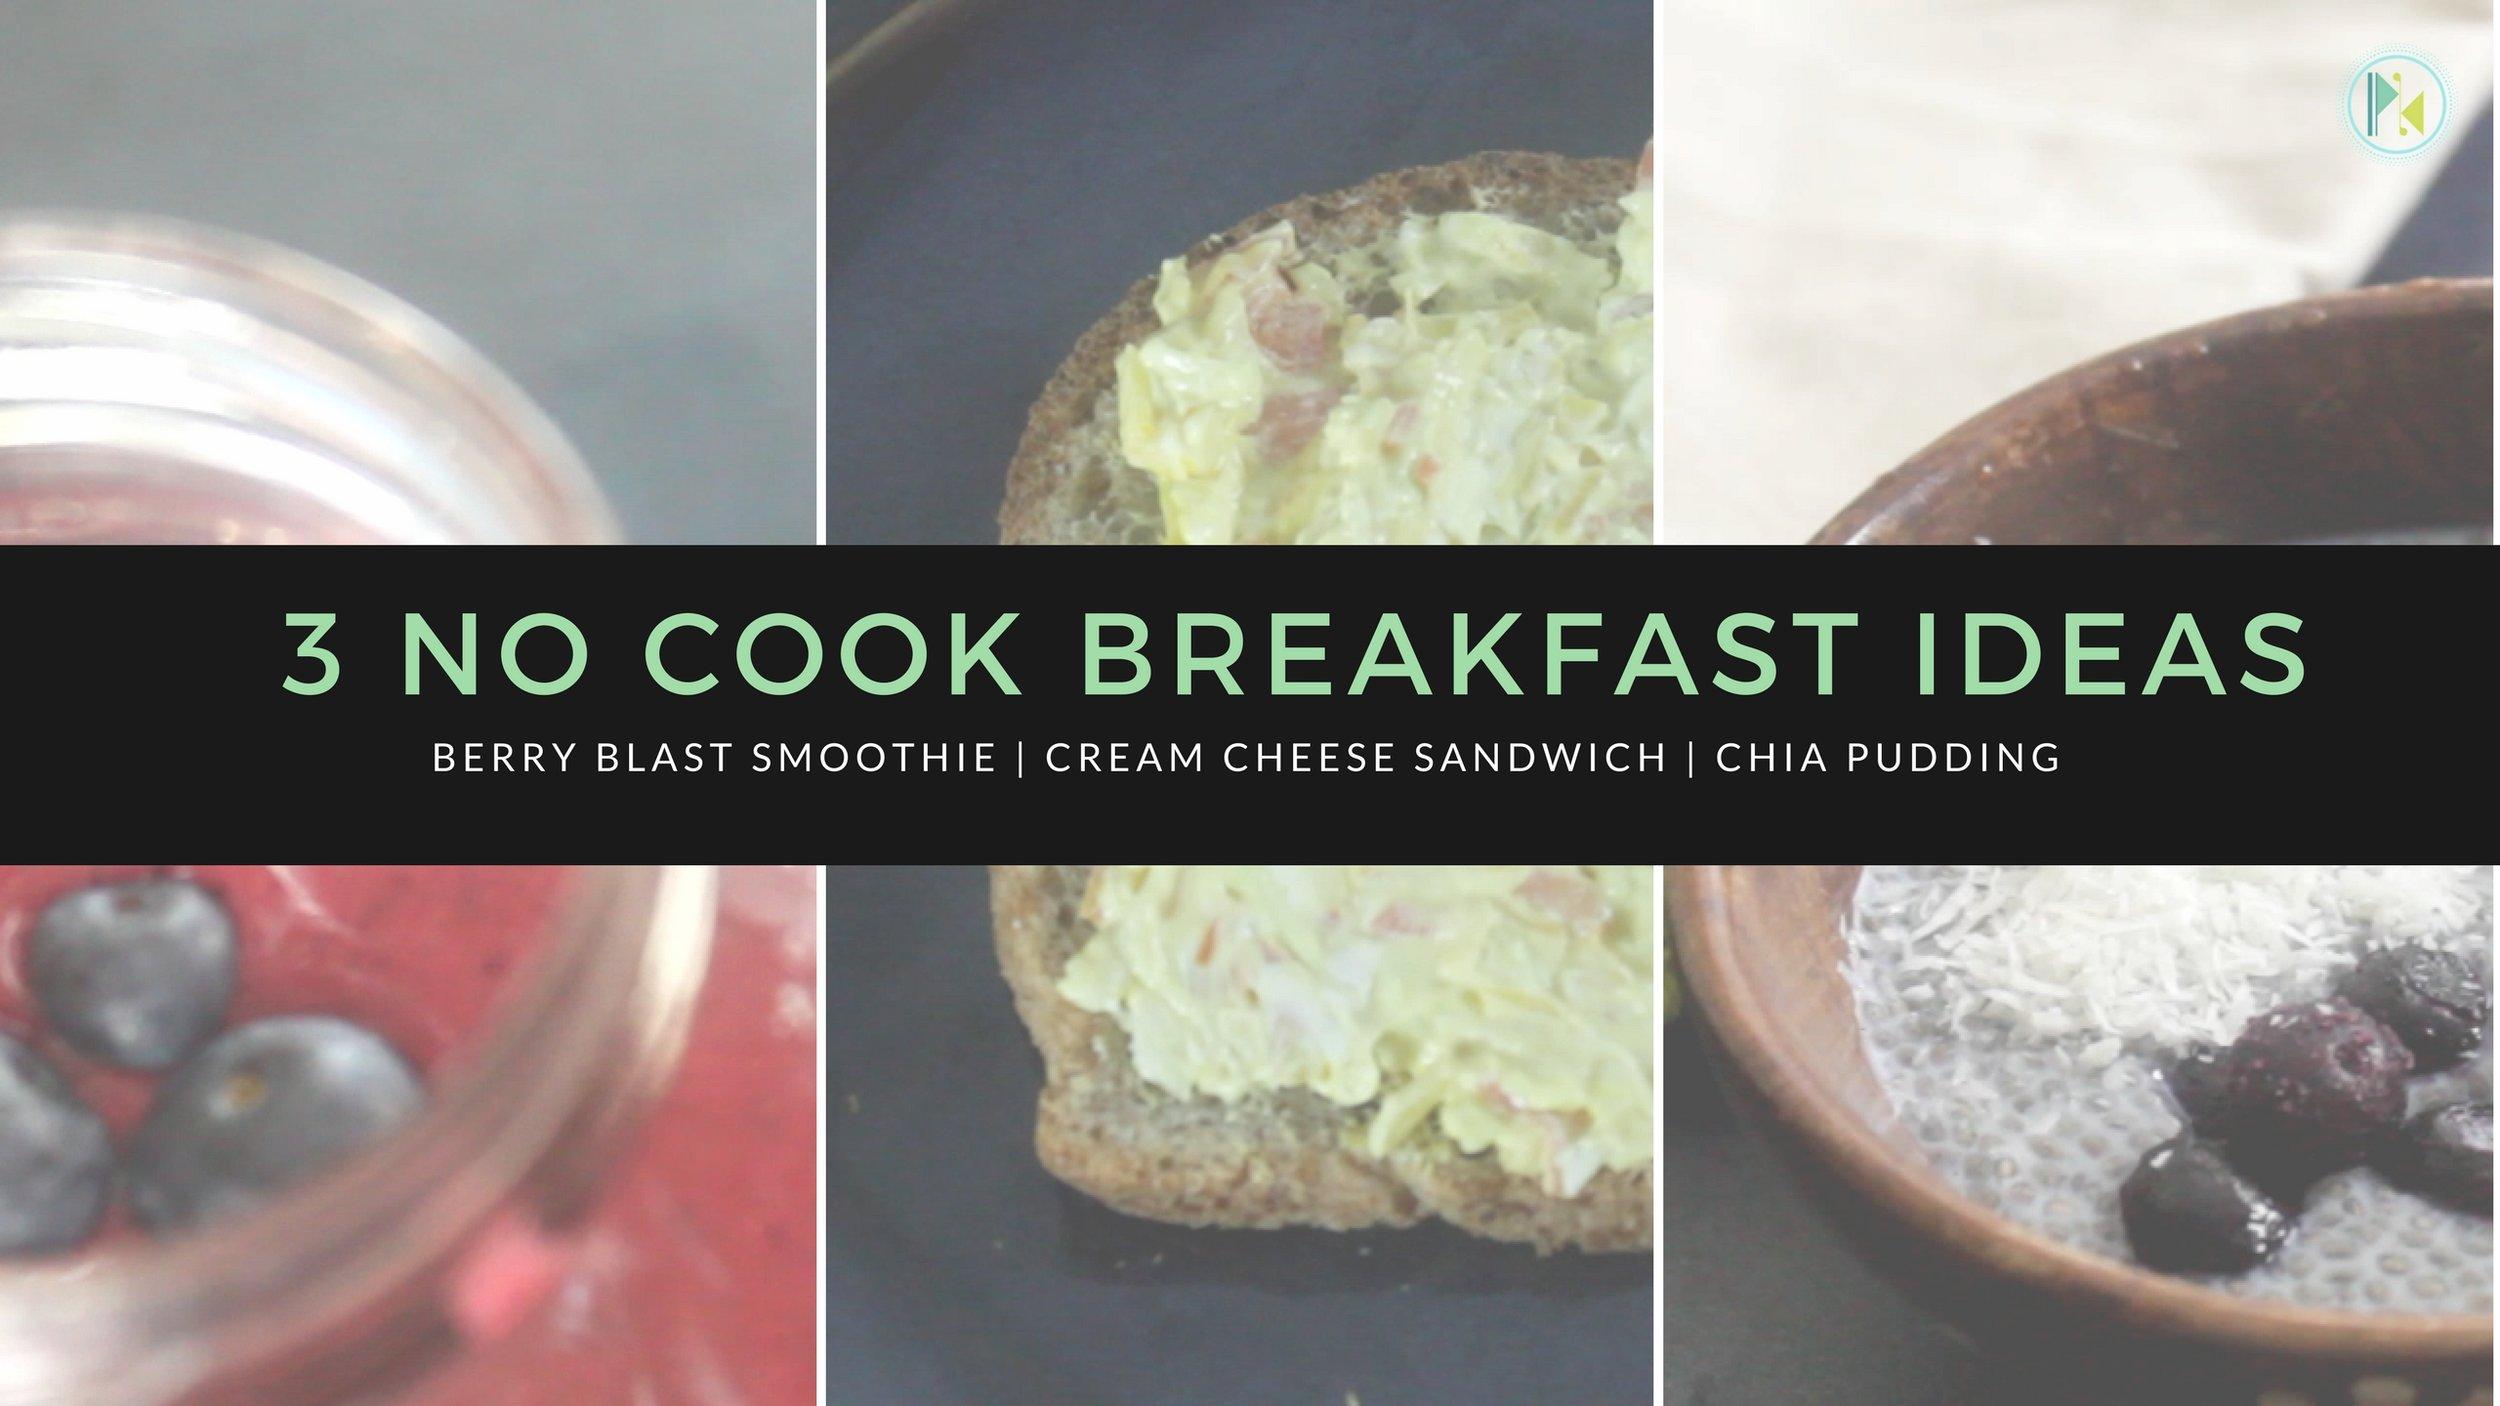 No cook breakfast ideas